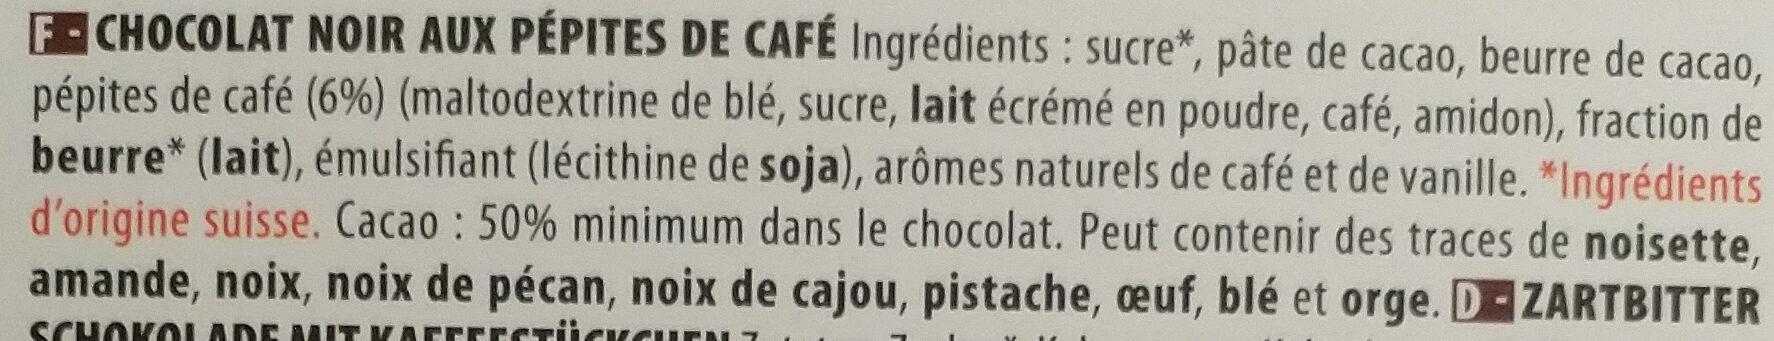 Chocolat Noir Café - Ingredients - fr